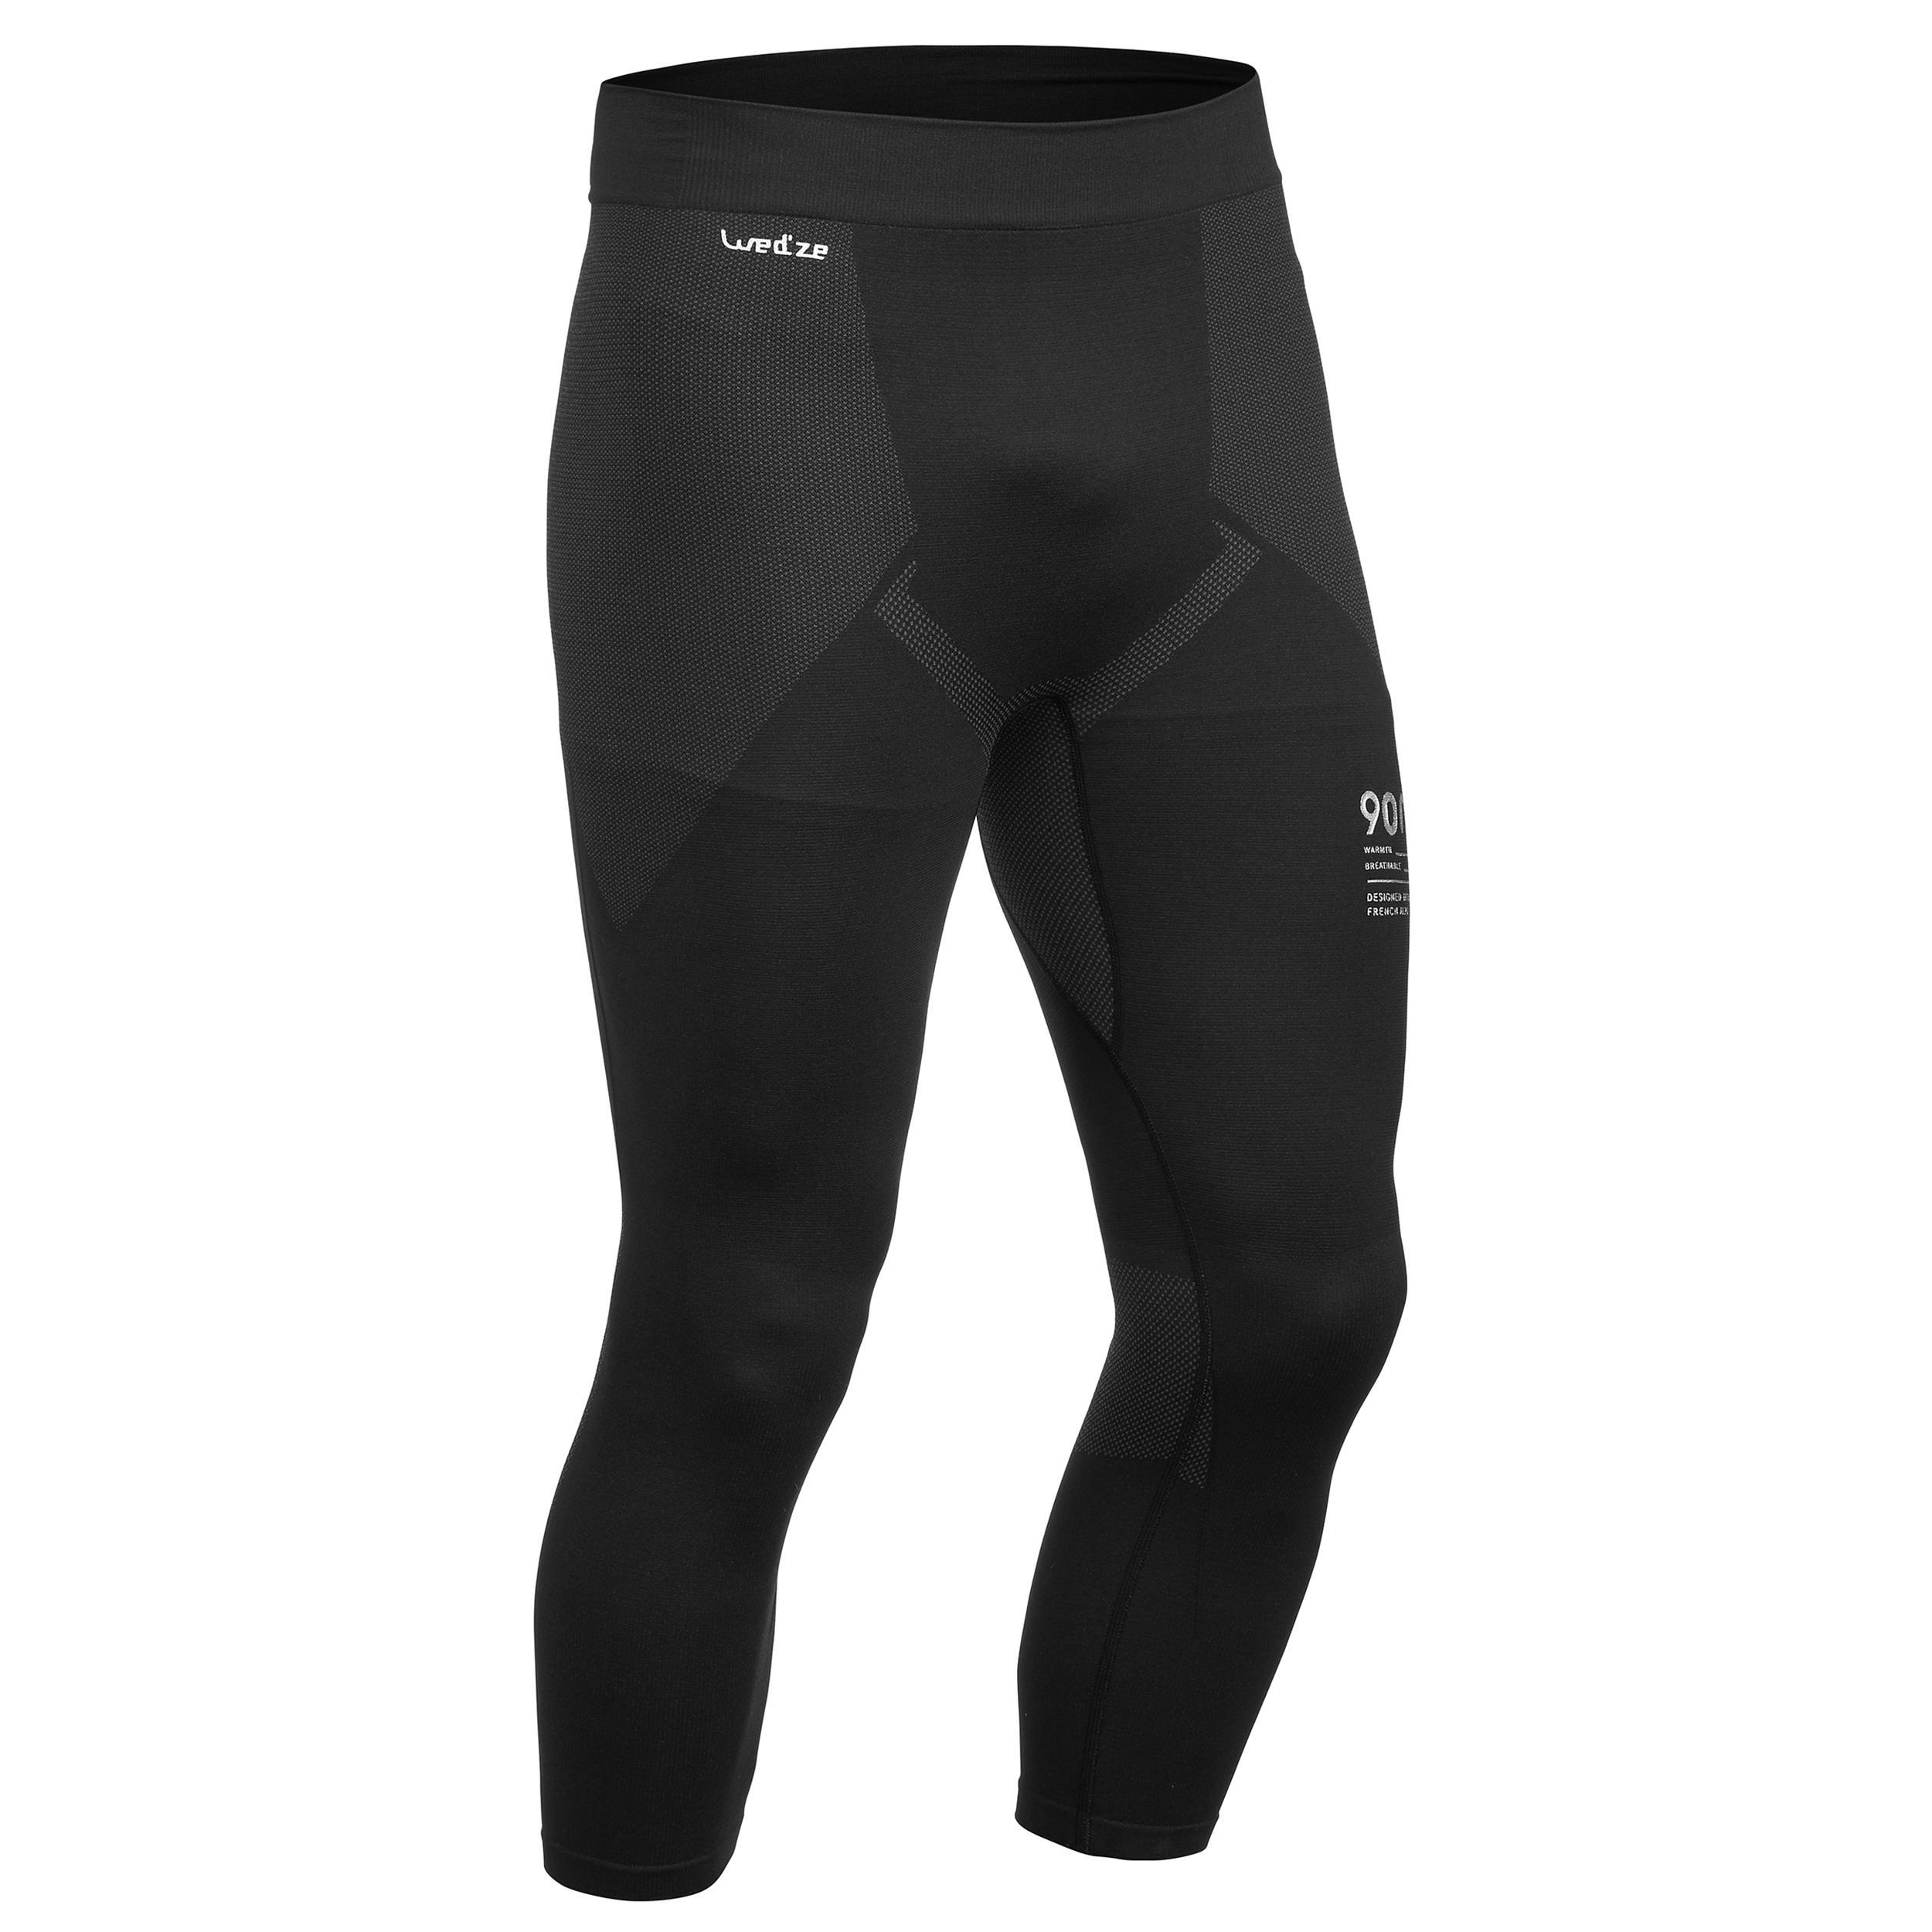 900 Men's Ski Base-Layer Bottoms - Black/Grey